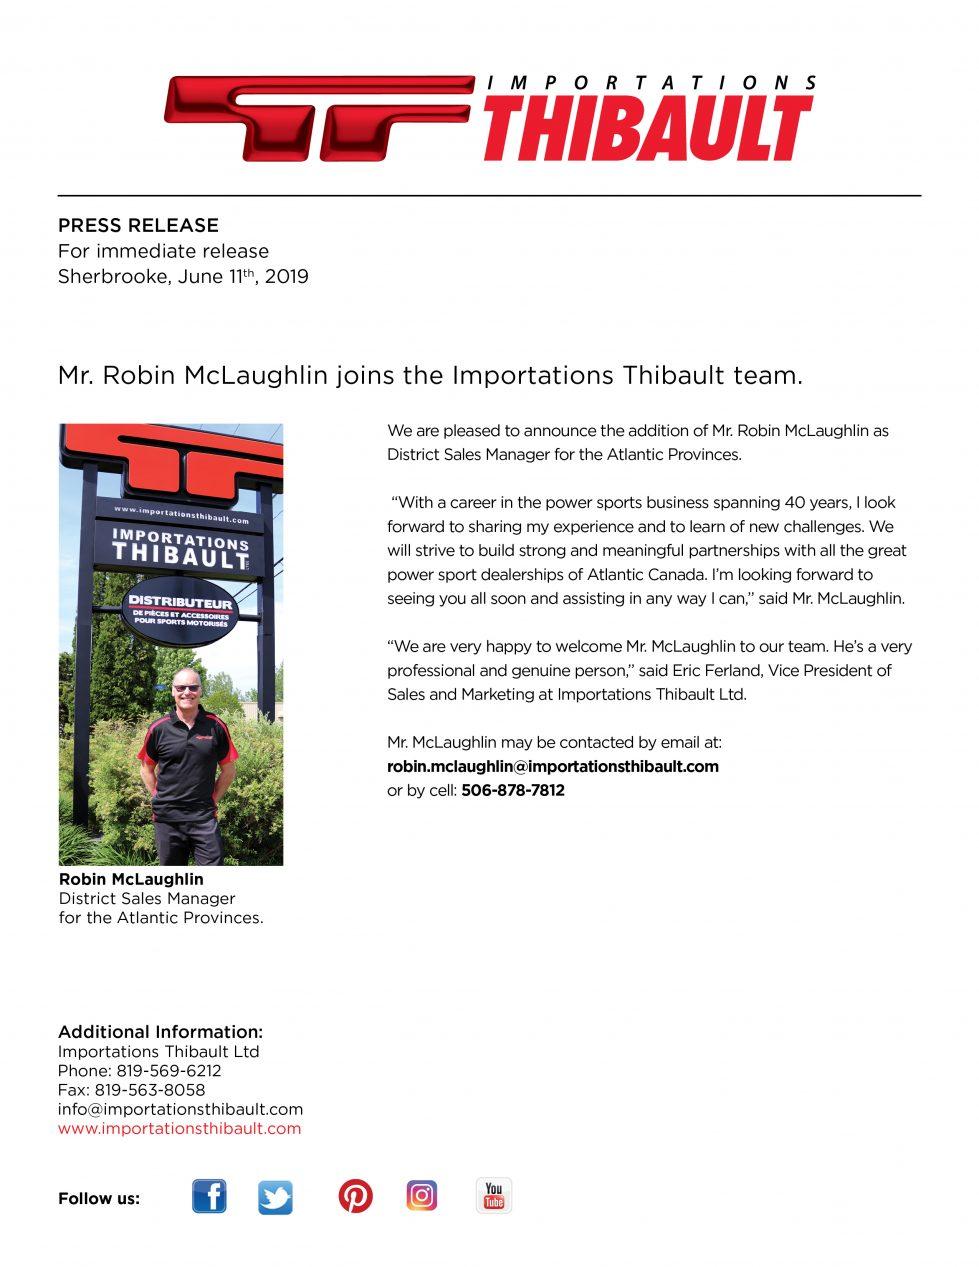 Mr. Robin McLaughlin joins the Importations Thibault team.